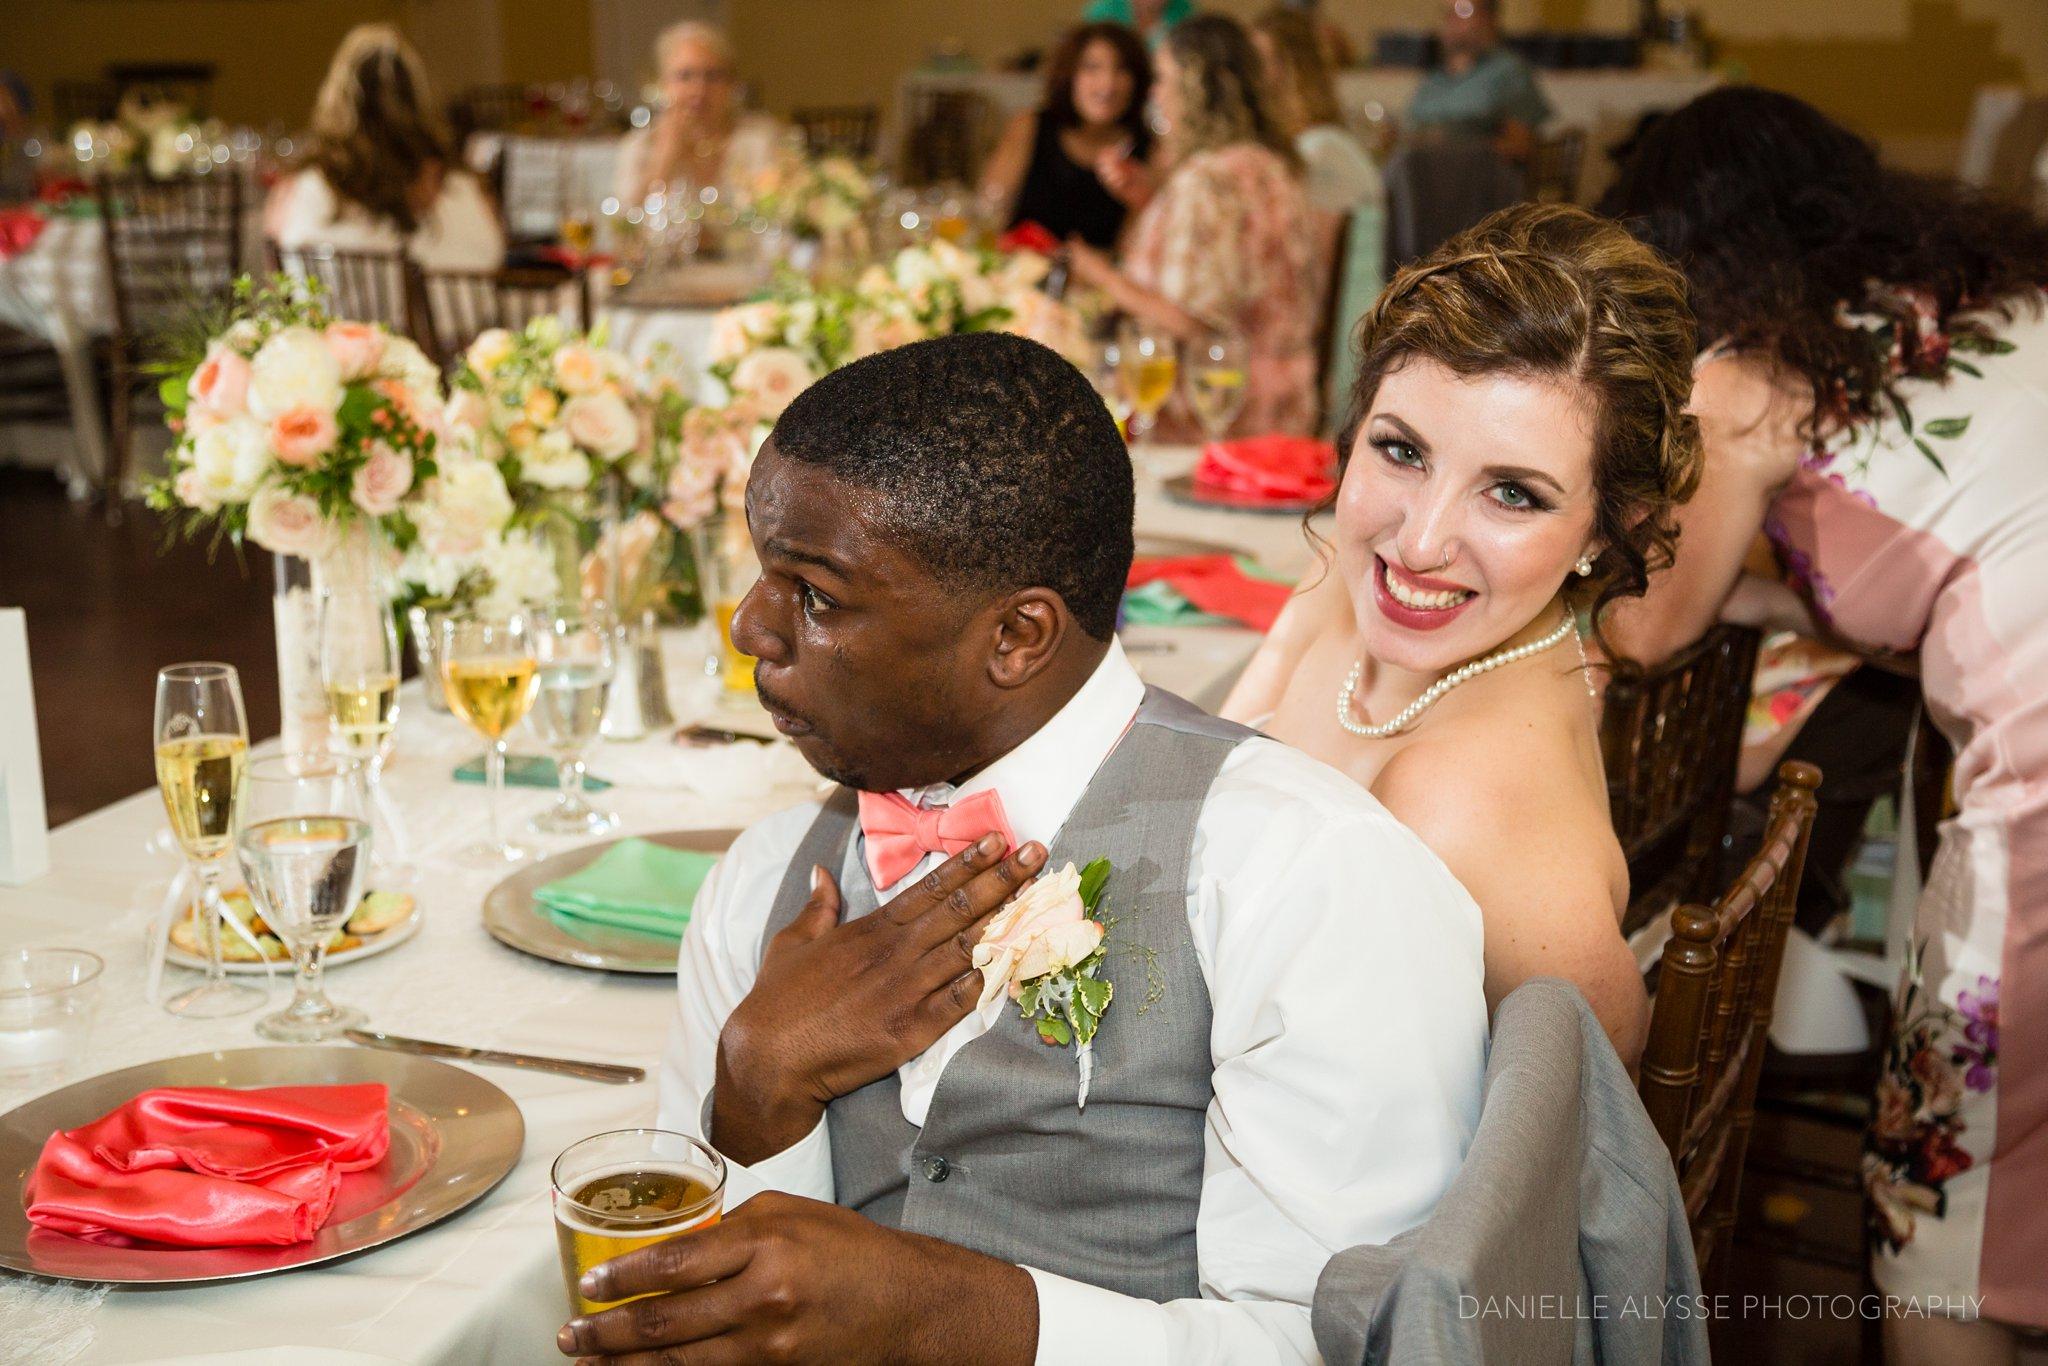 170507_blog_megan_david_wedding_loomis_flower_farm_inn_danielle_alysse_photography_sacramento_photographer0497_WEB.jpg